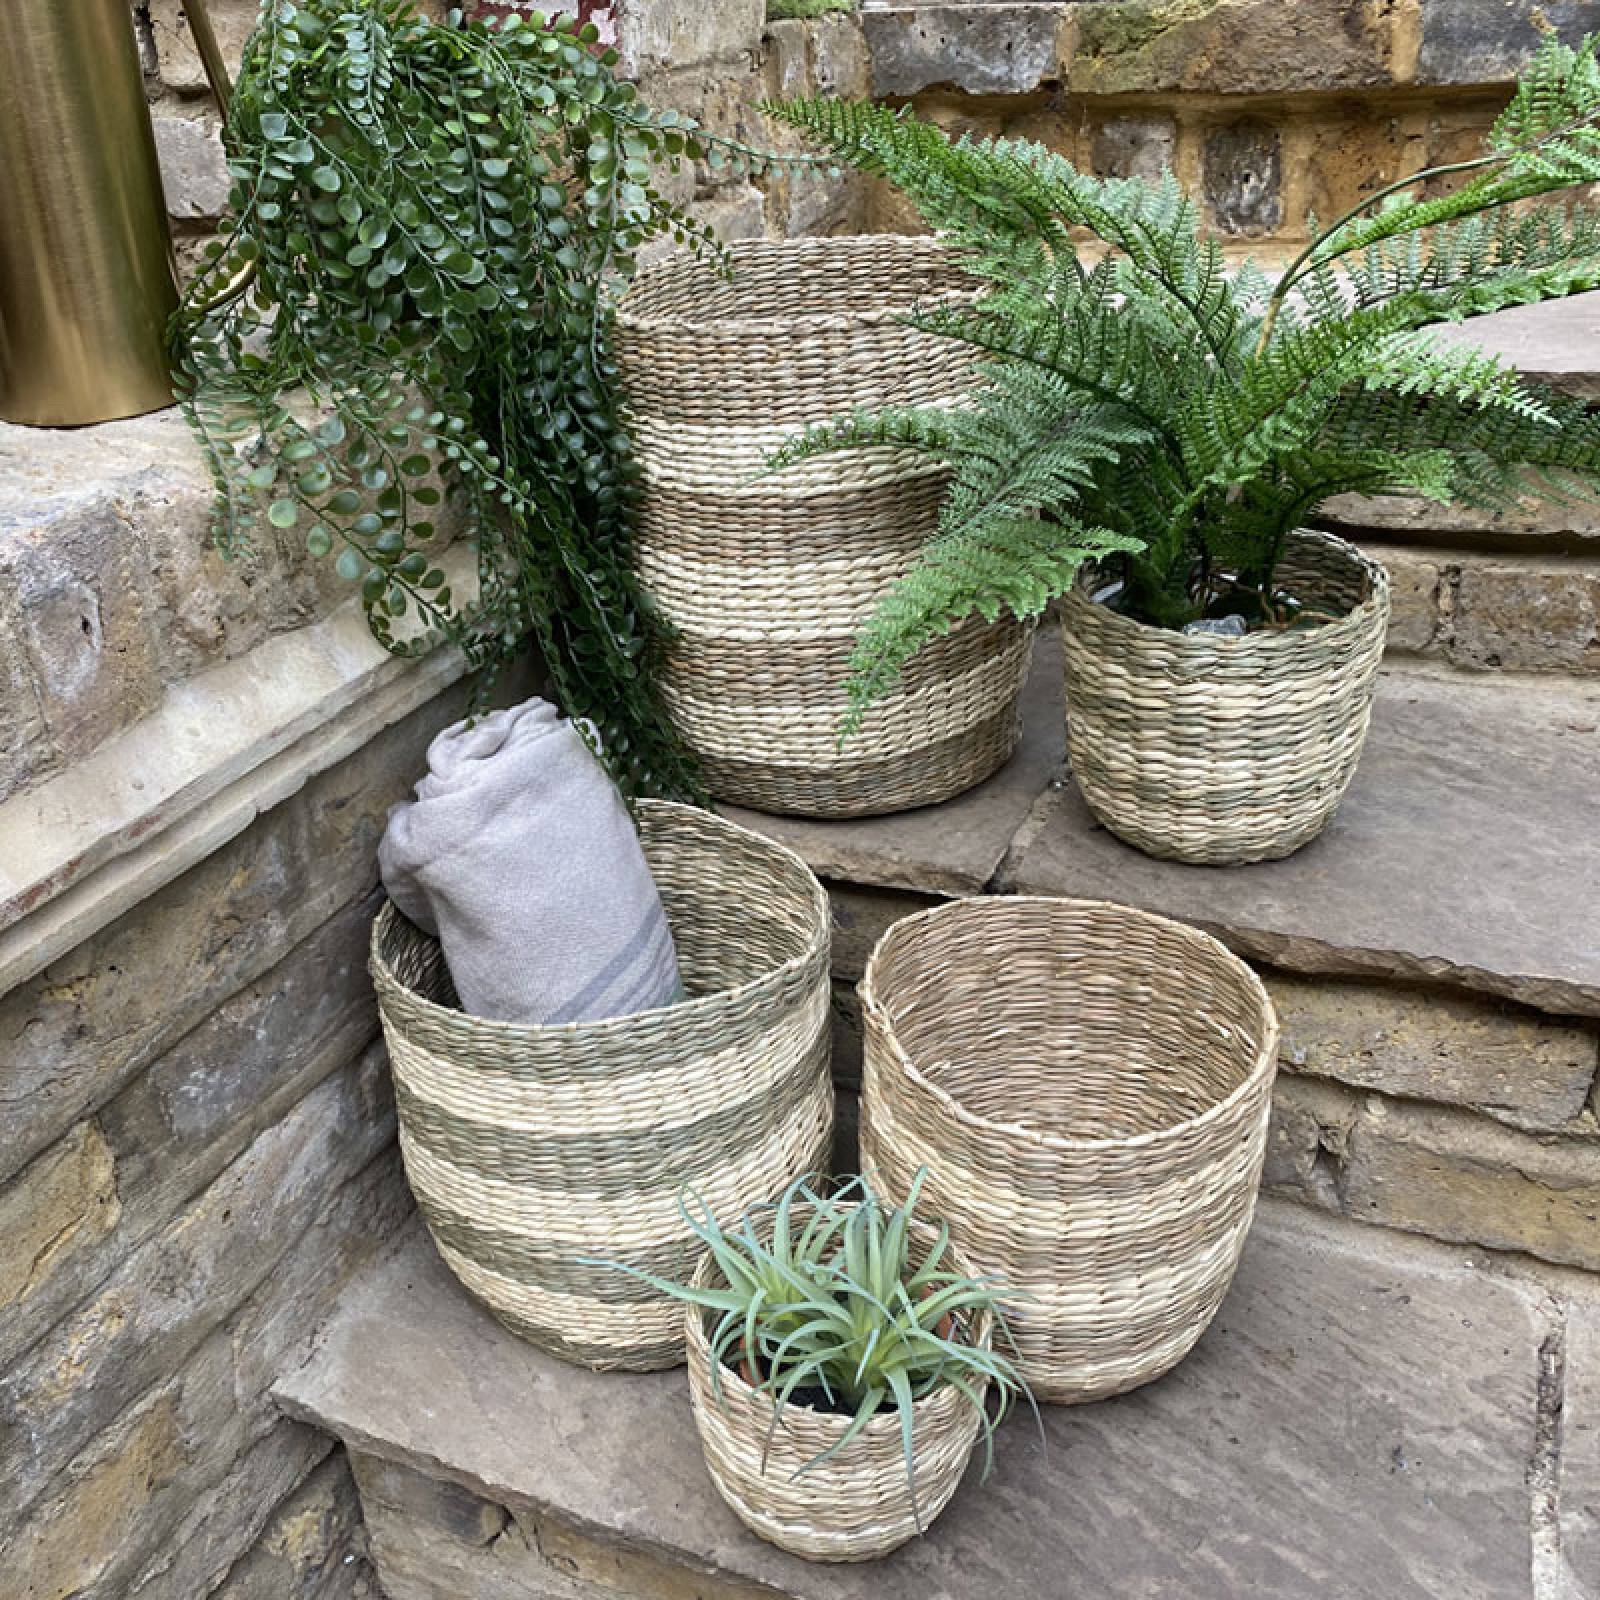 Small Striped Two Tone Striped Basket H:16cm thumbnails